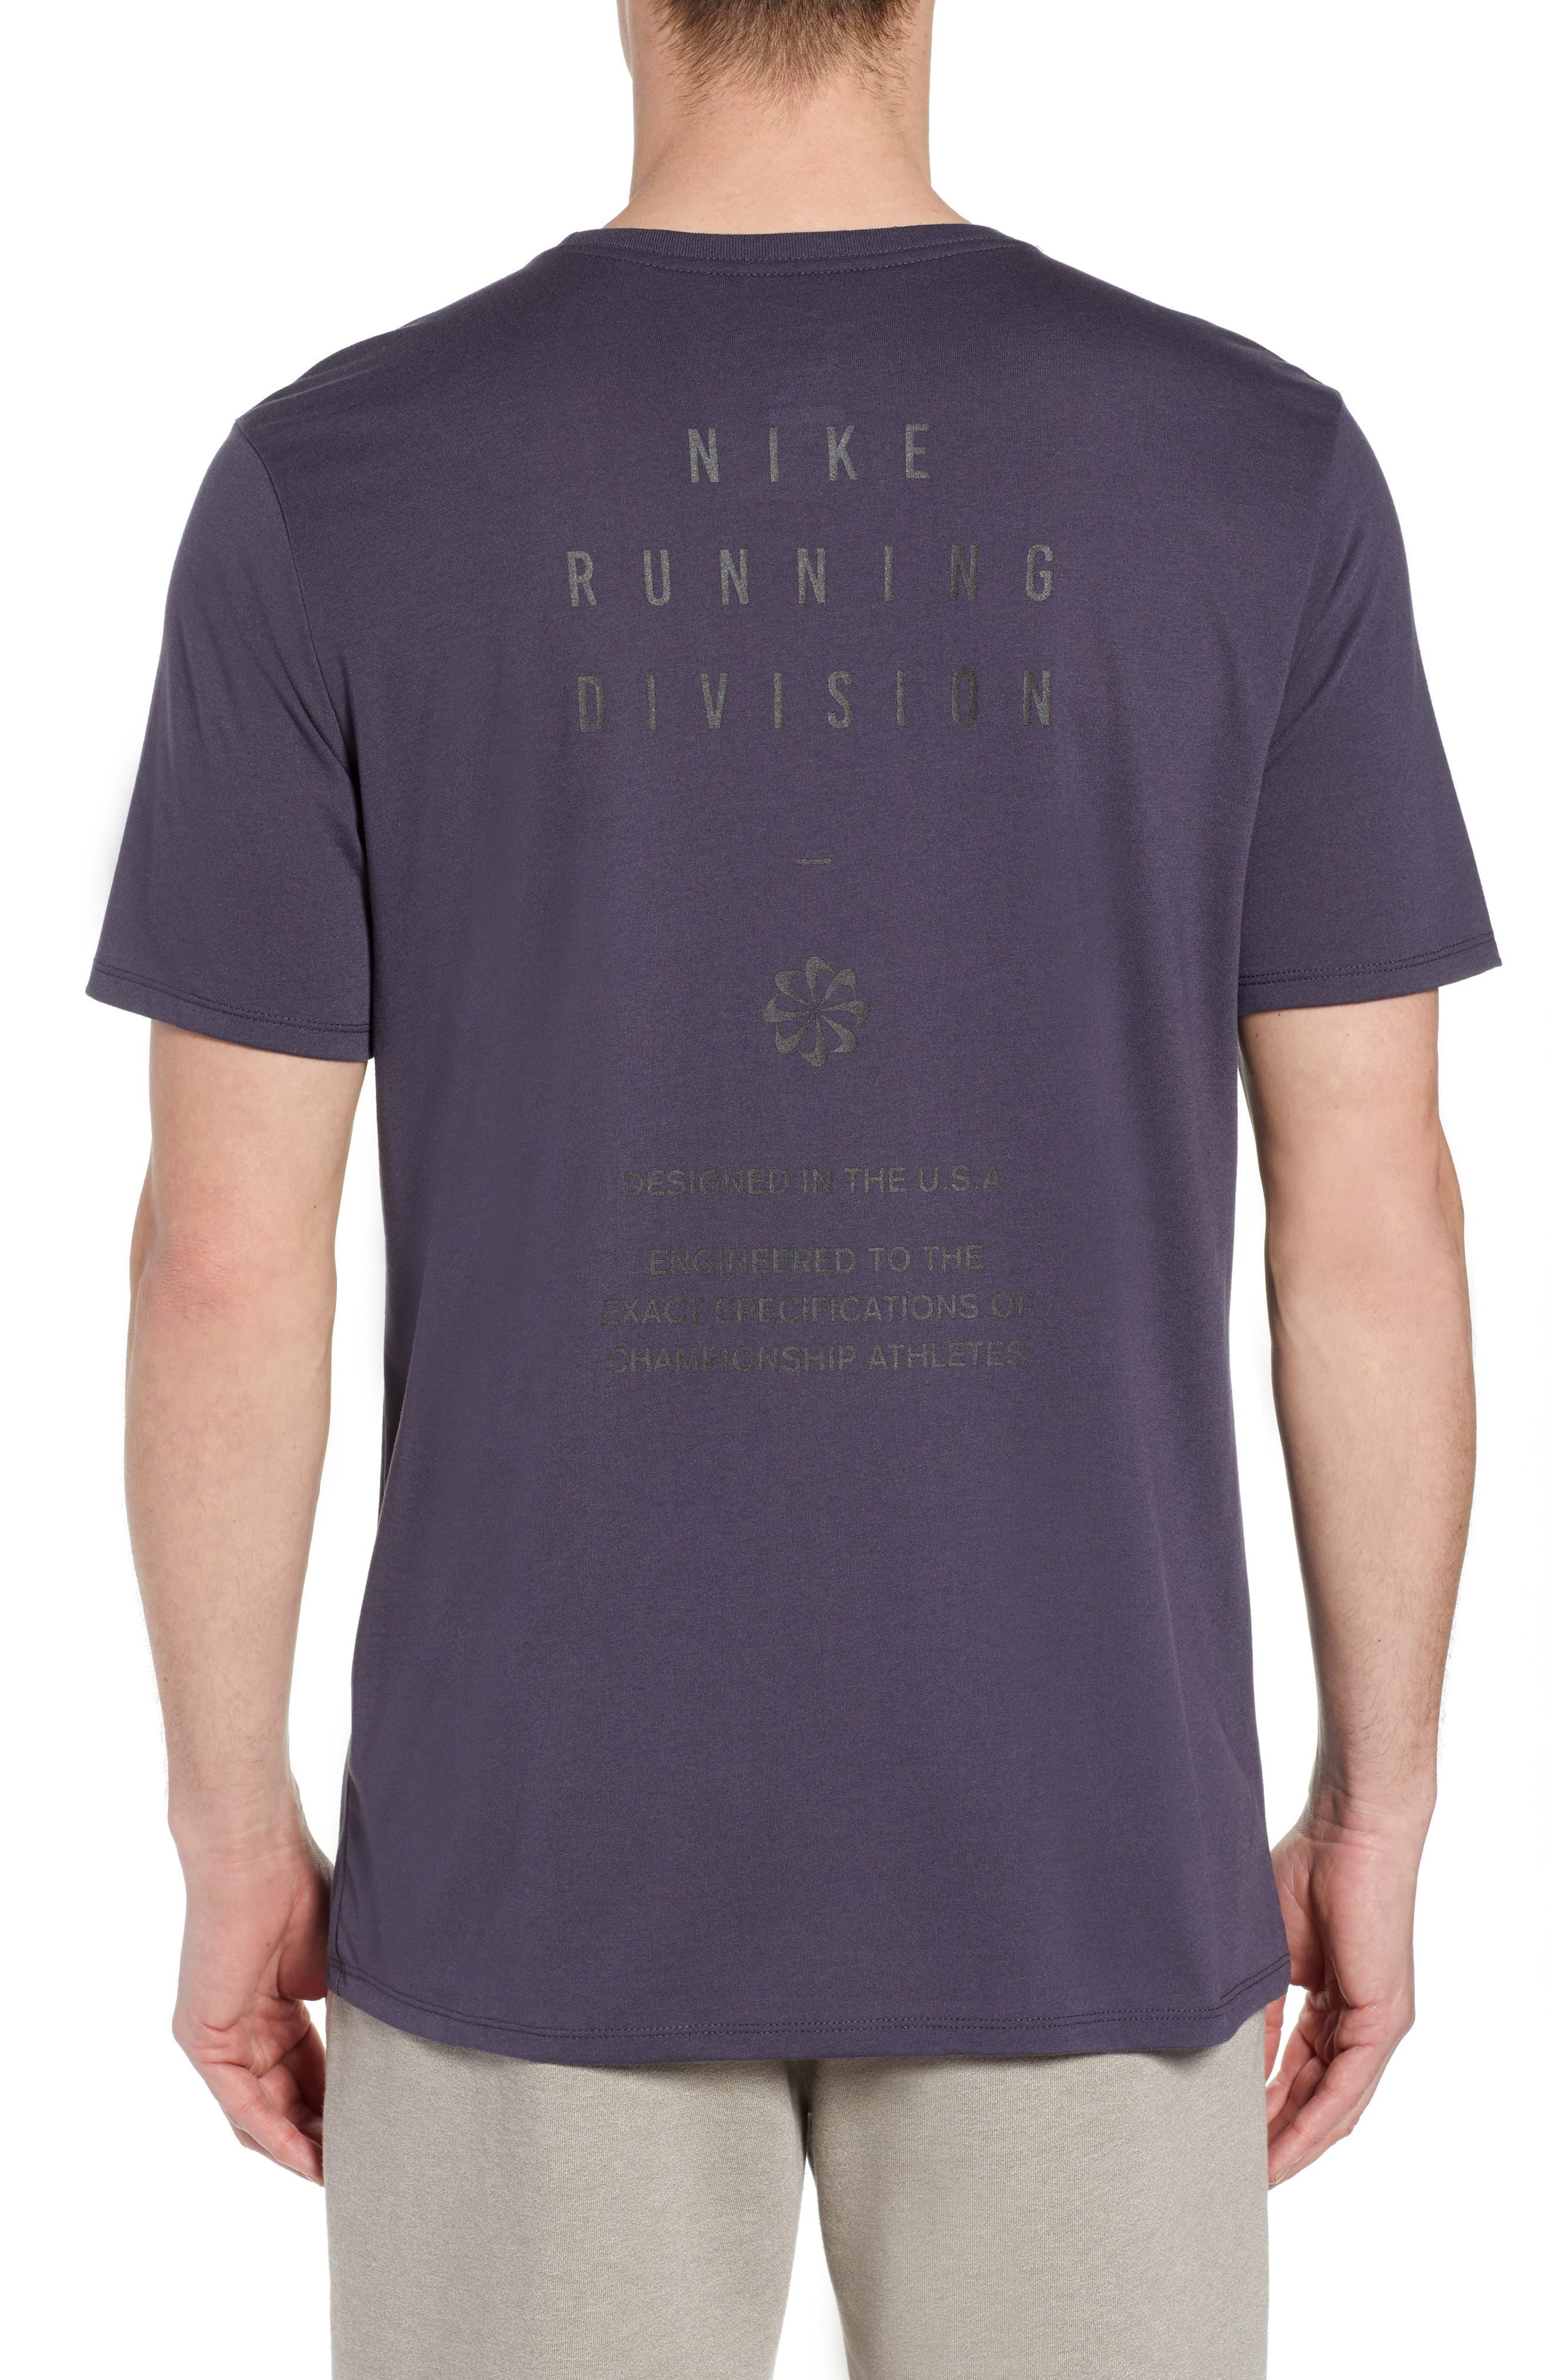 Dry Running Division T-Shirt,                             Alternate thumbnail 2, color,                             GRIDIRON/ GUNSMOKE